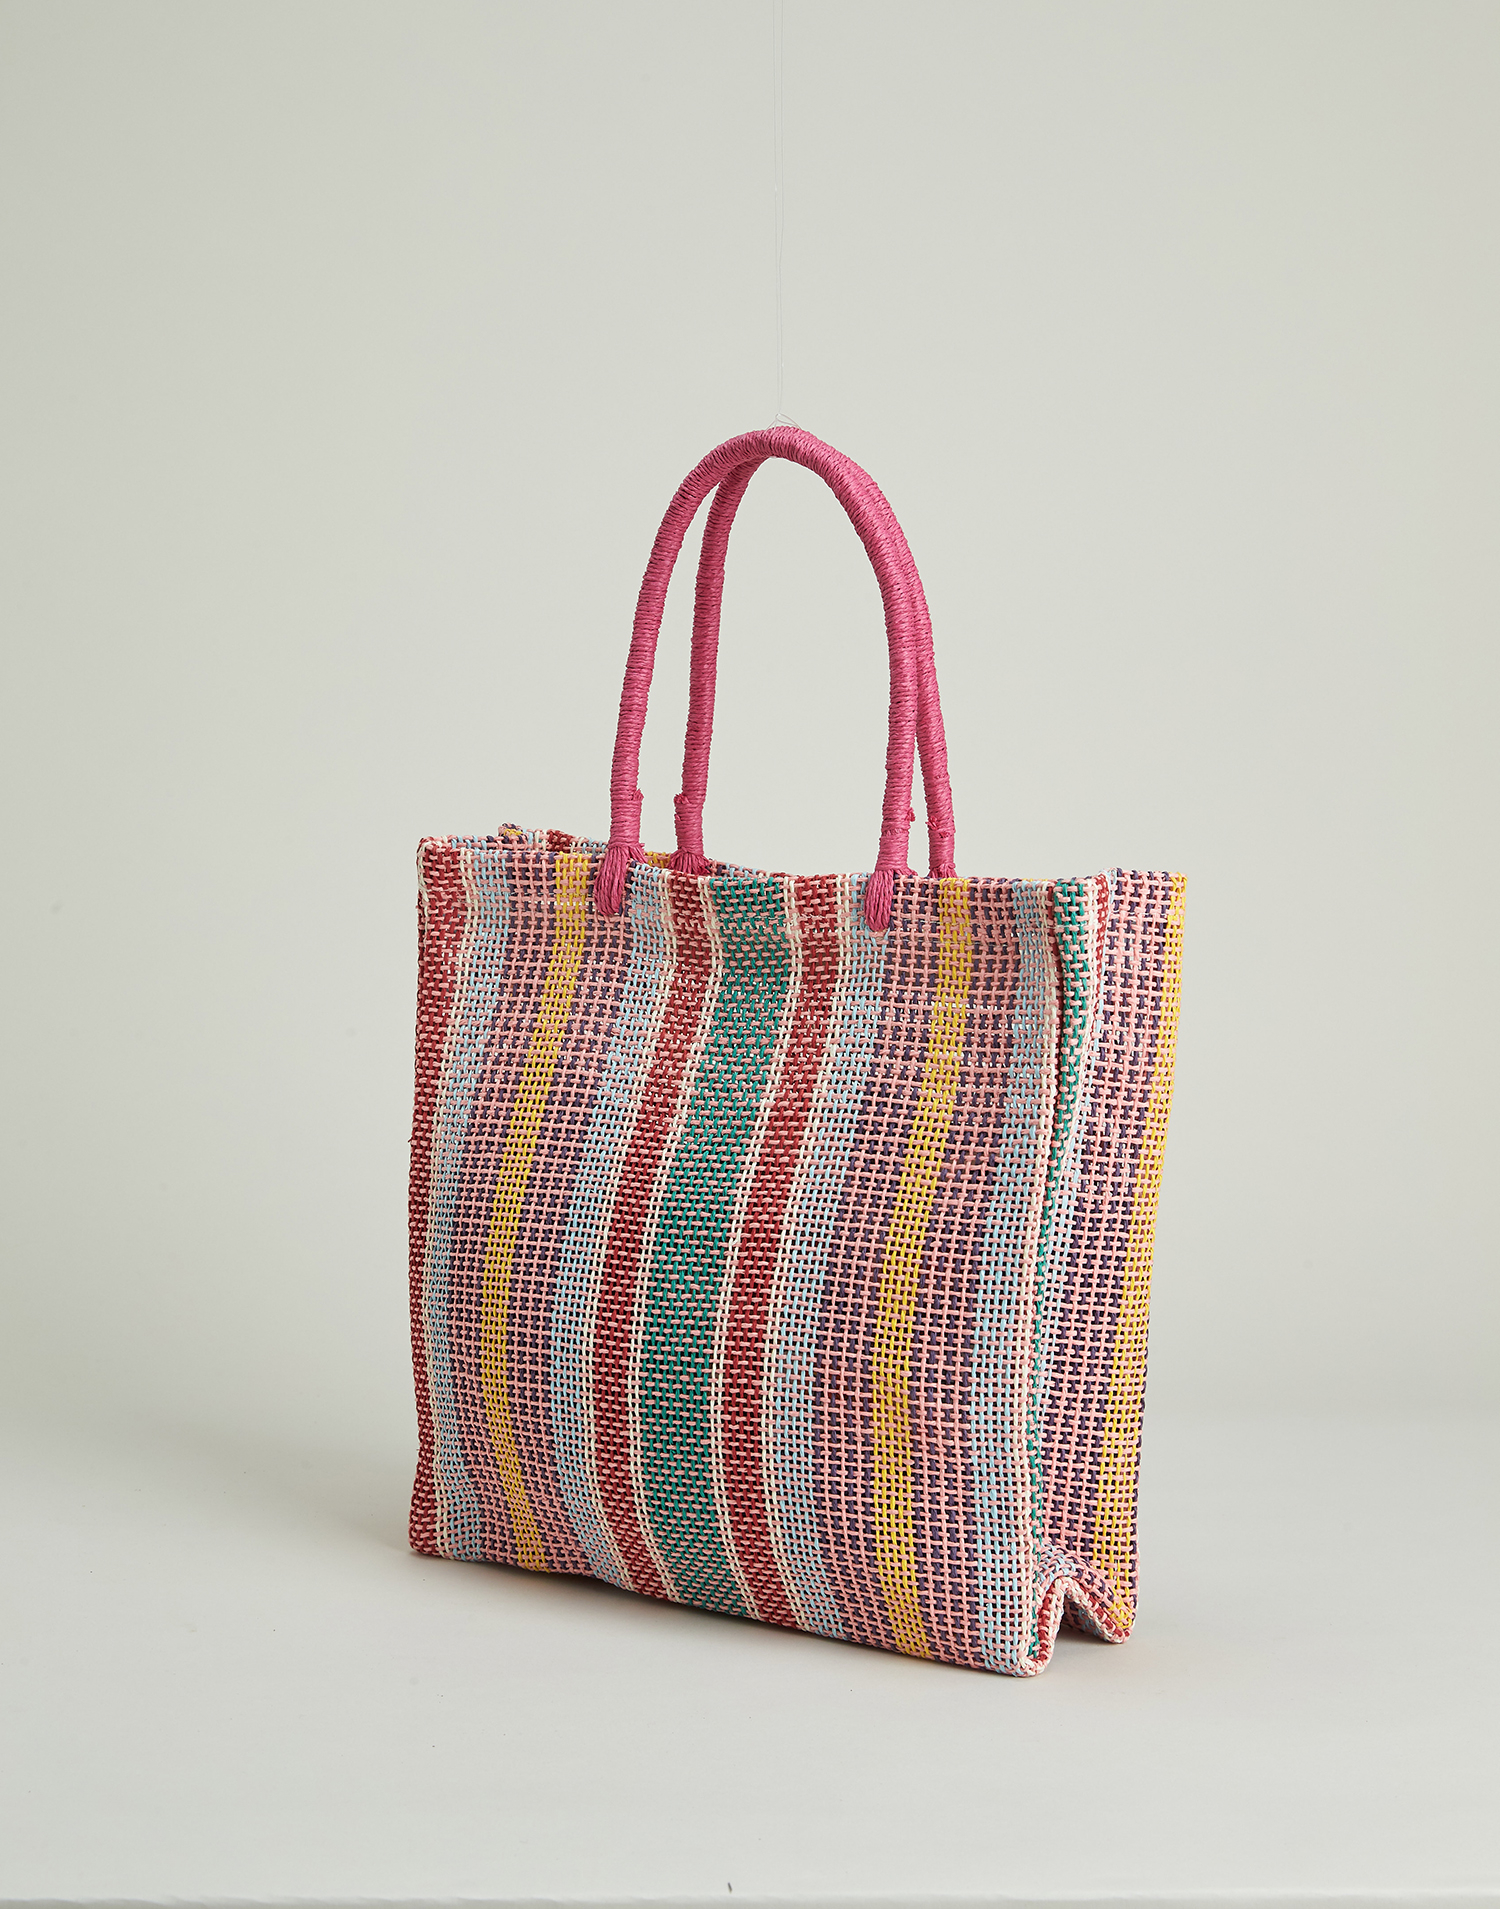 Multicolored paper bag